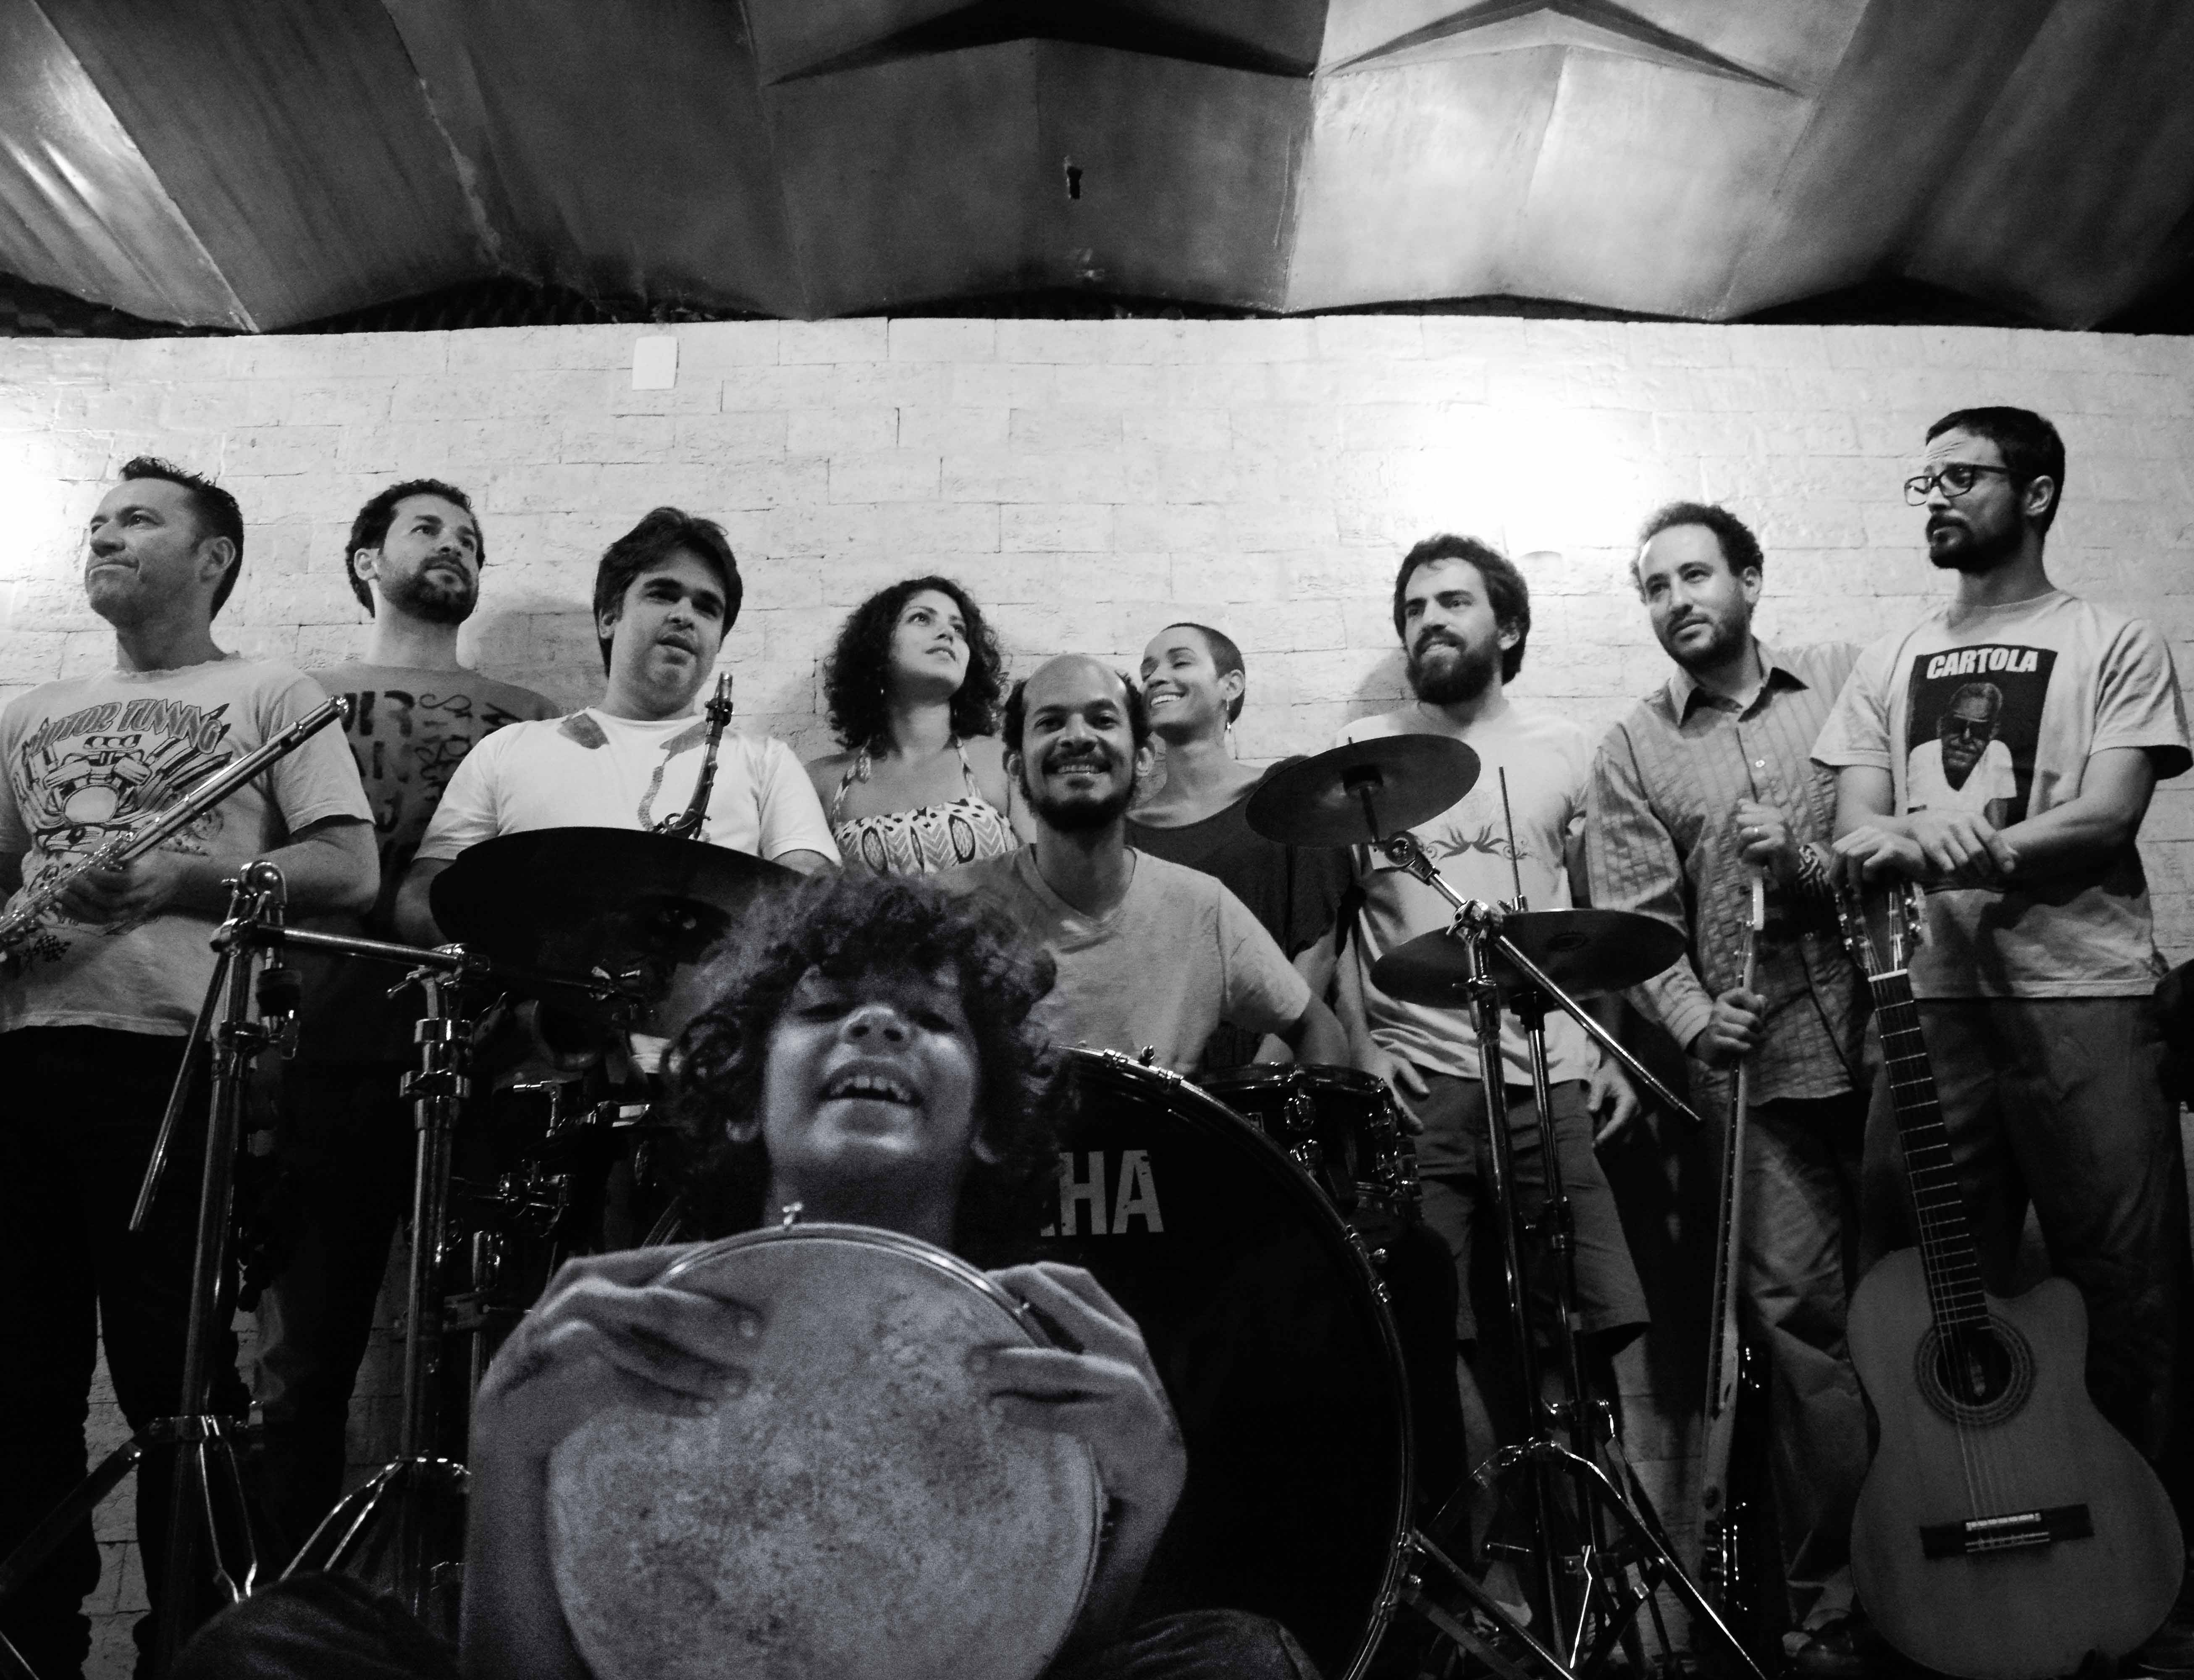 Lançamento do Álbum Preta dia 19 de Novembro de 2014 na CAIXA Cultural Brasília.